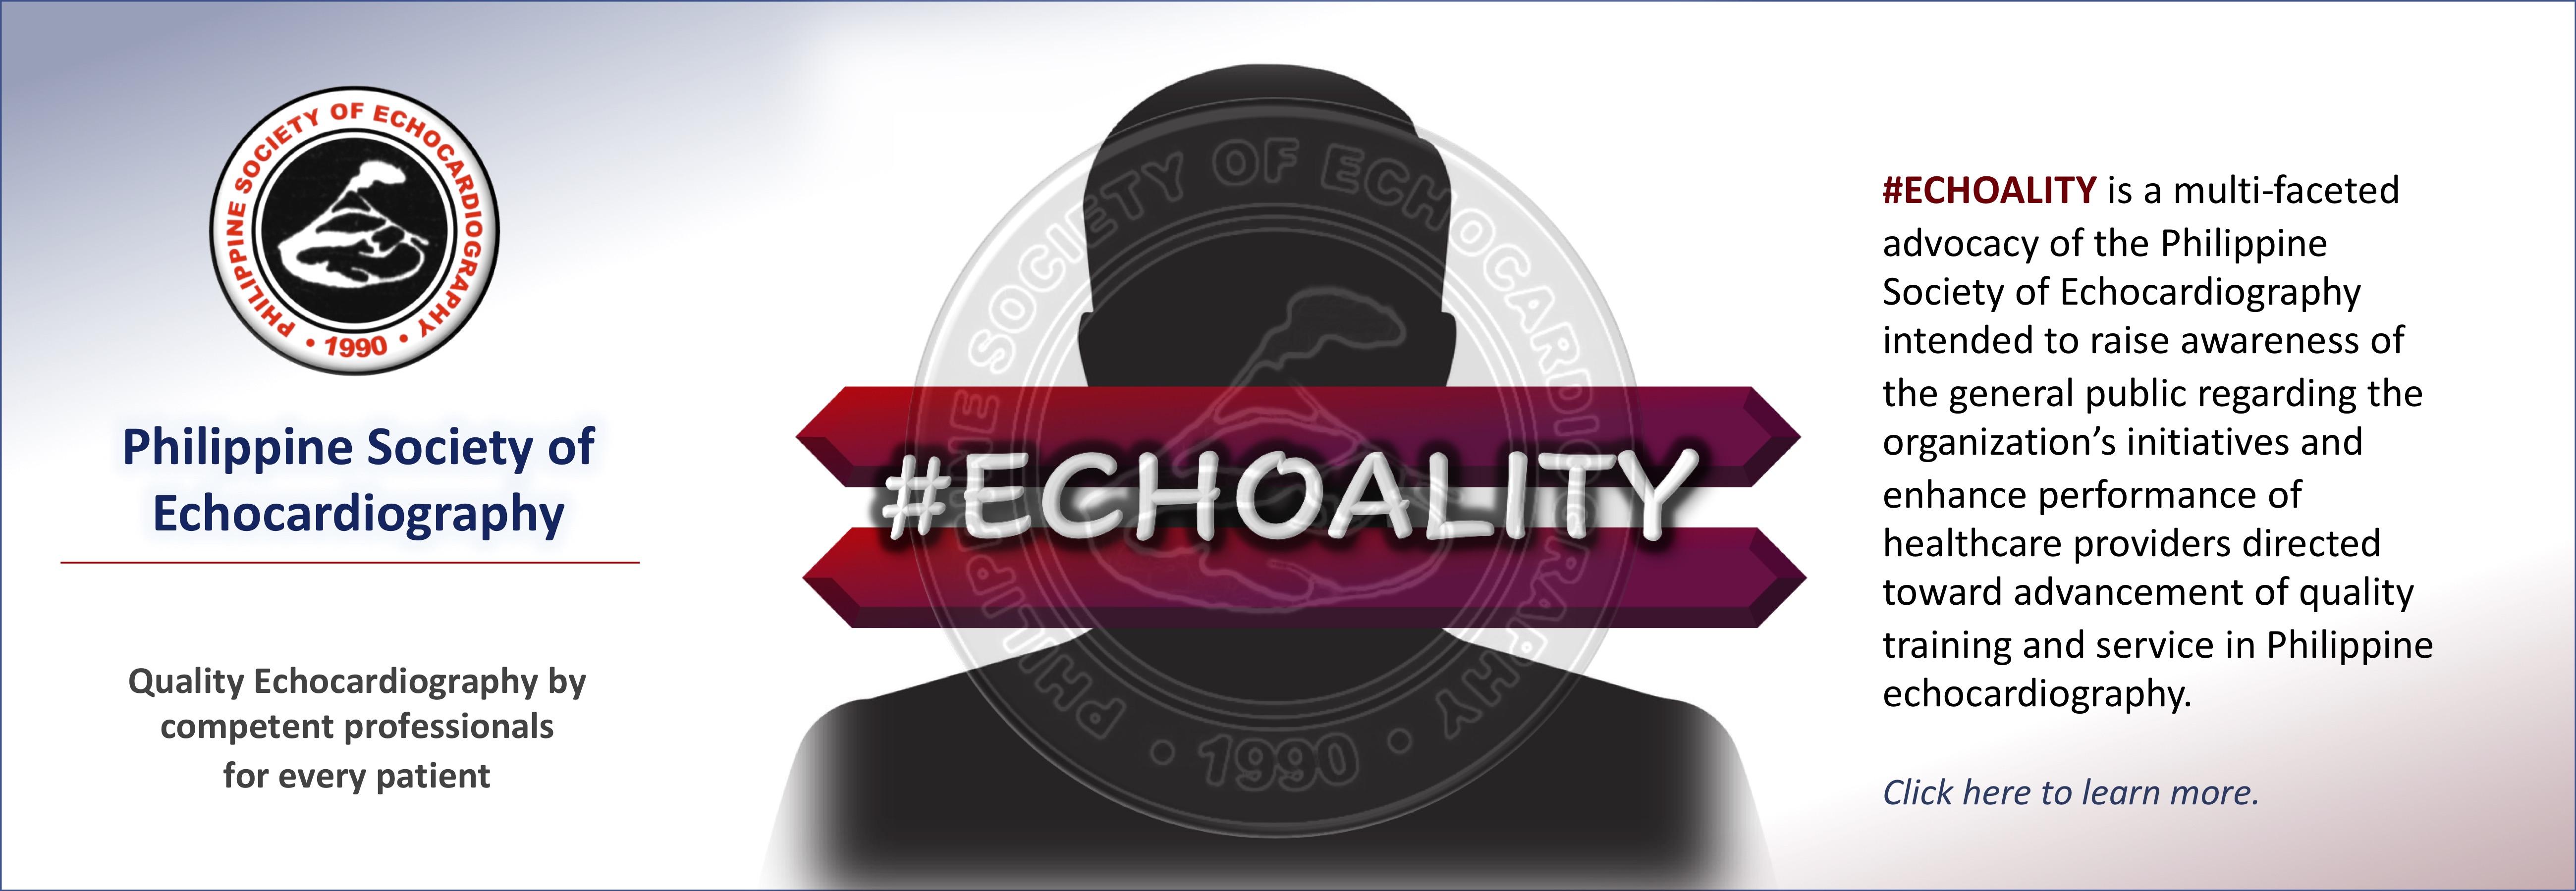 Echoality_campaign